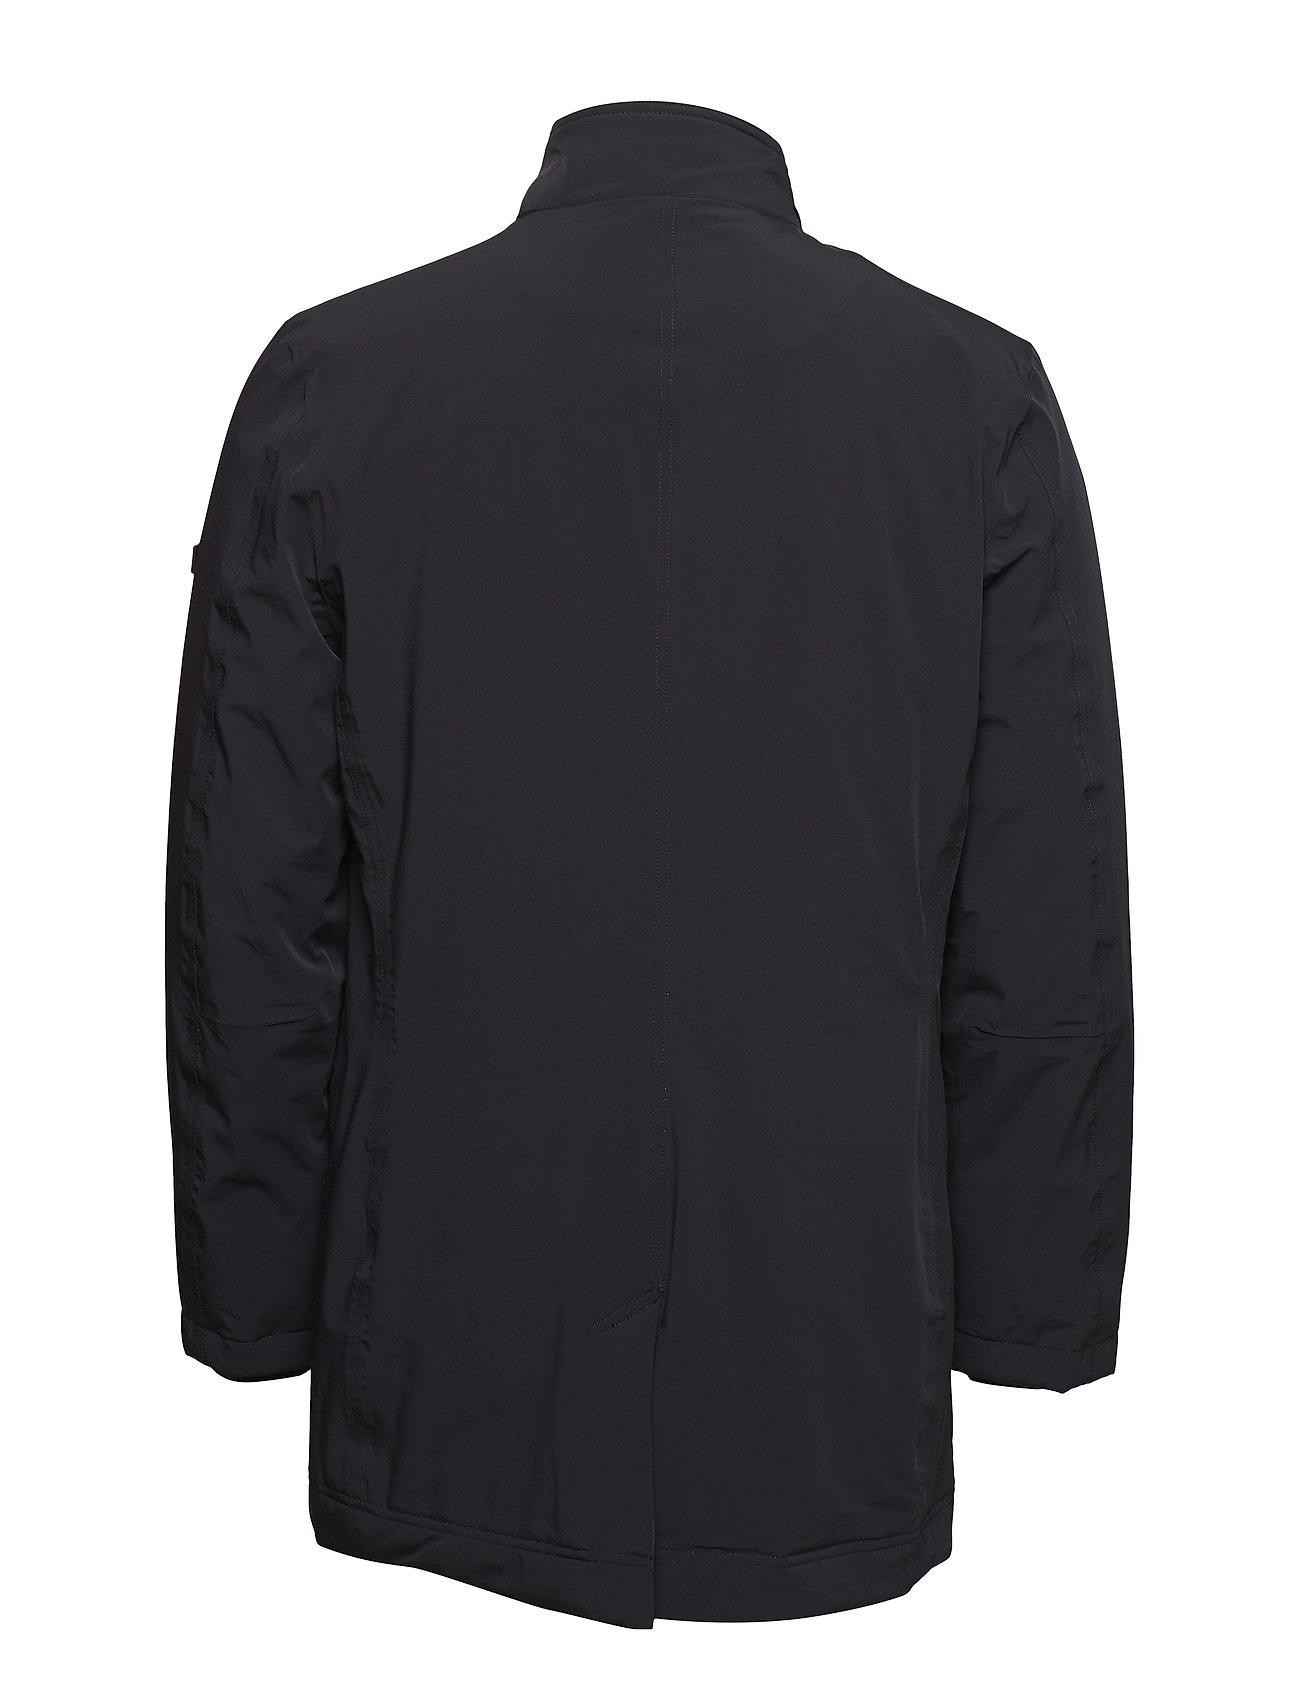 Technical Technical Carcoat In PrimaloftblackLindbergh Carcoat PXOkZiuT